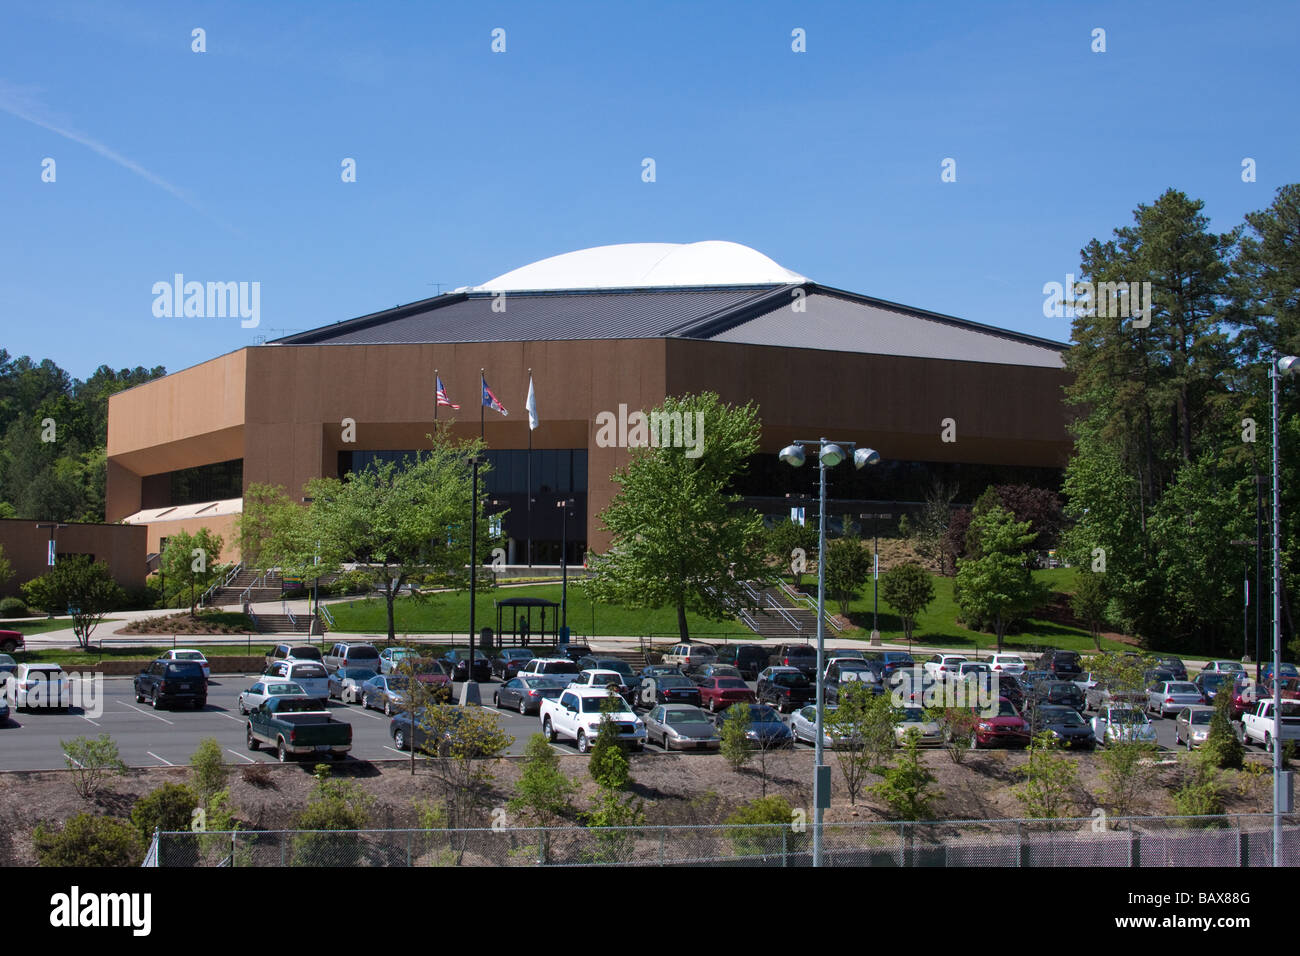 Dean Smith Center (Deandome), University of North Carolina, Chapel Hill - Stock Image